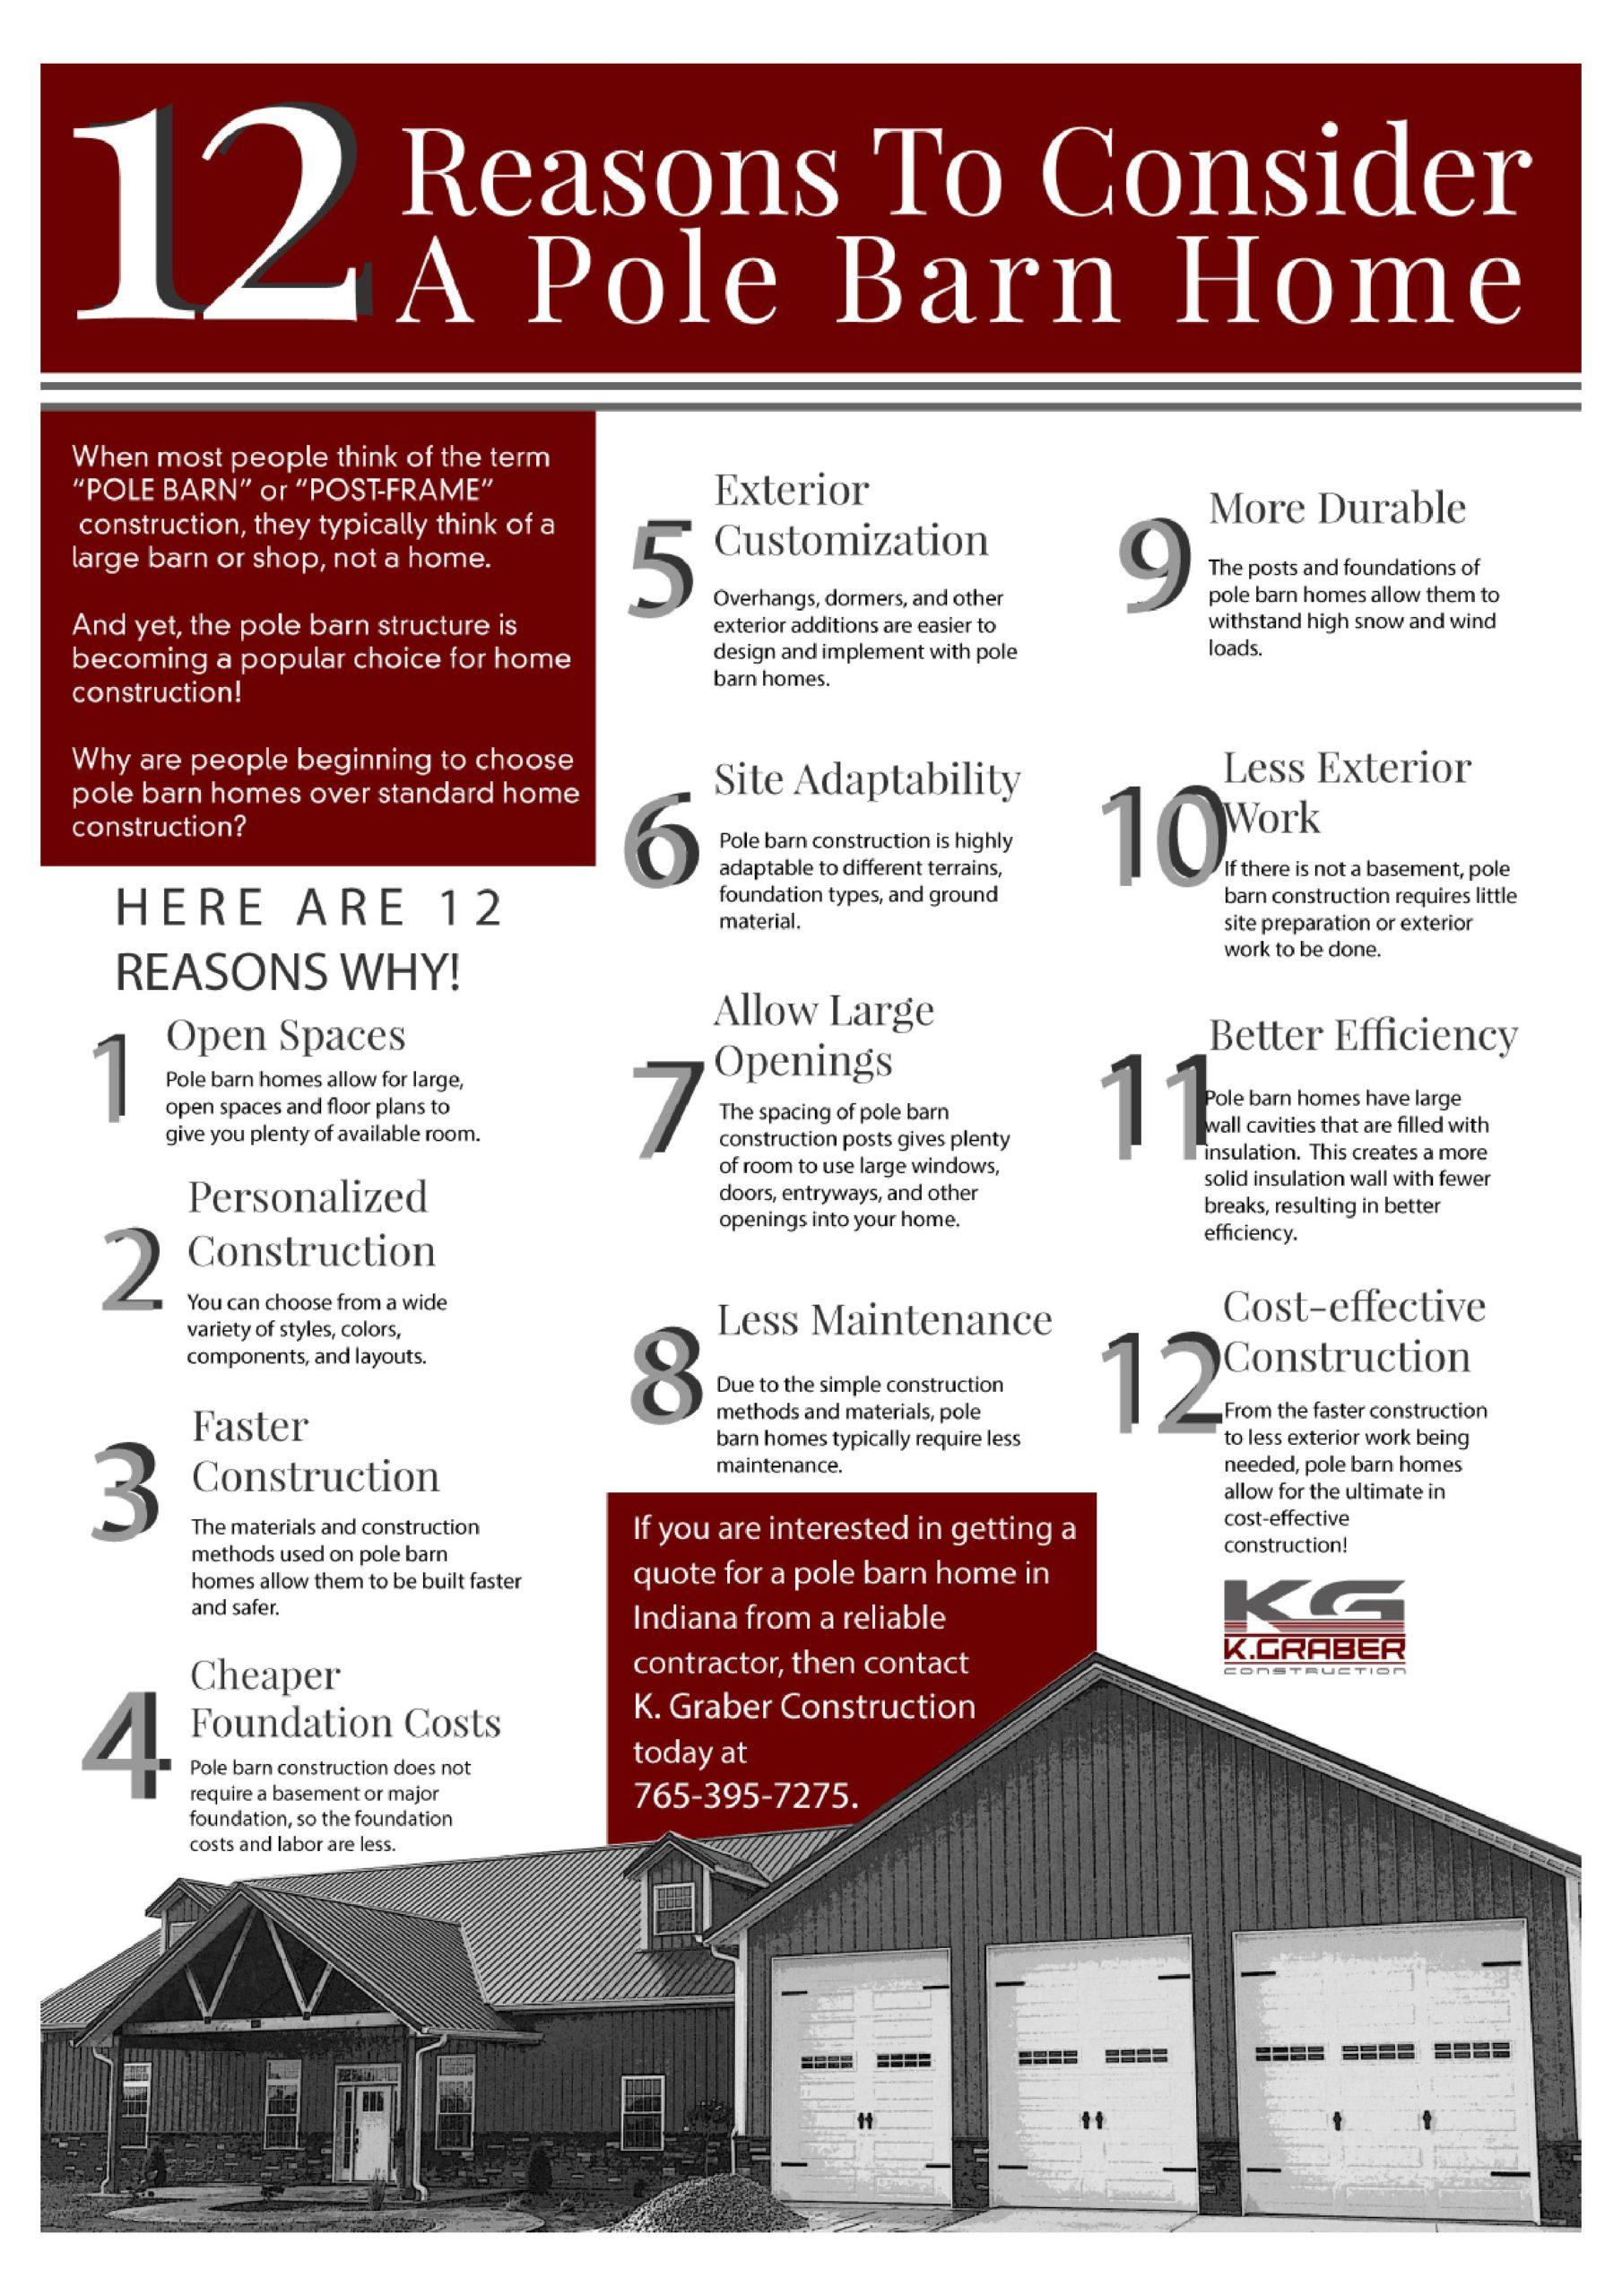 12 Benefits of Pole Barn Homes